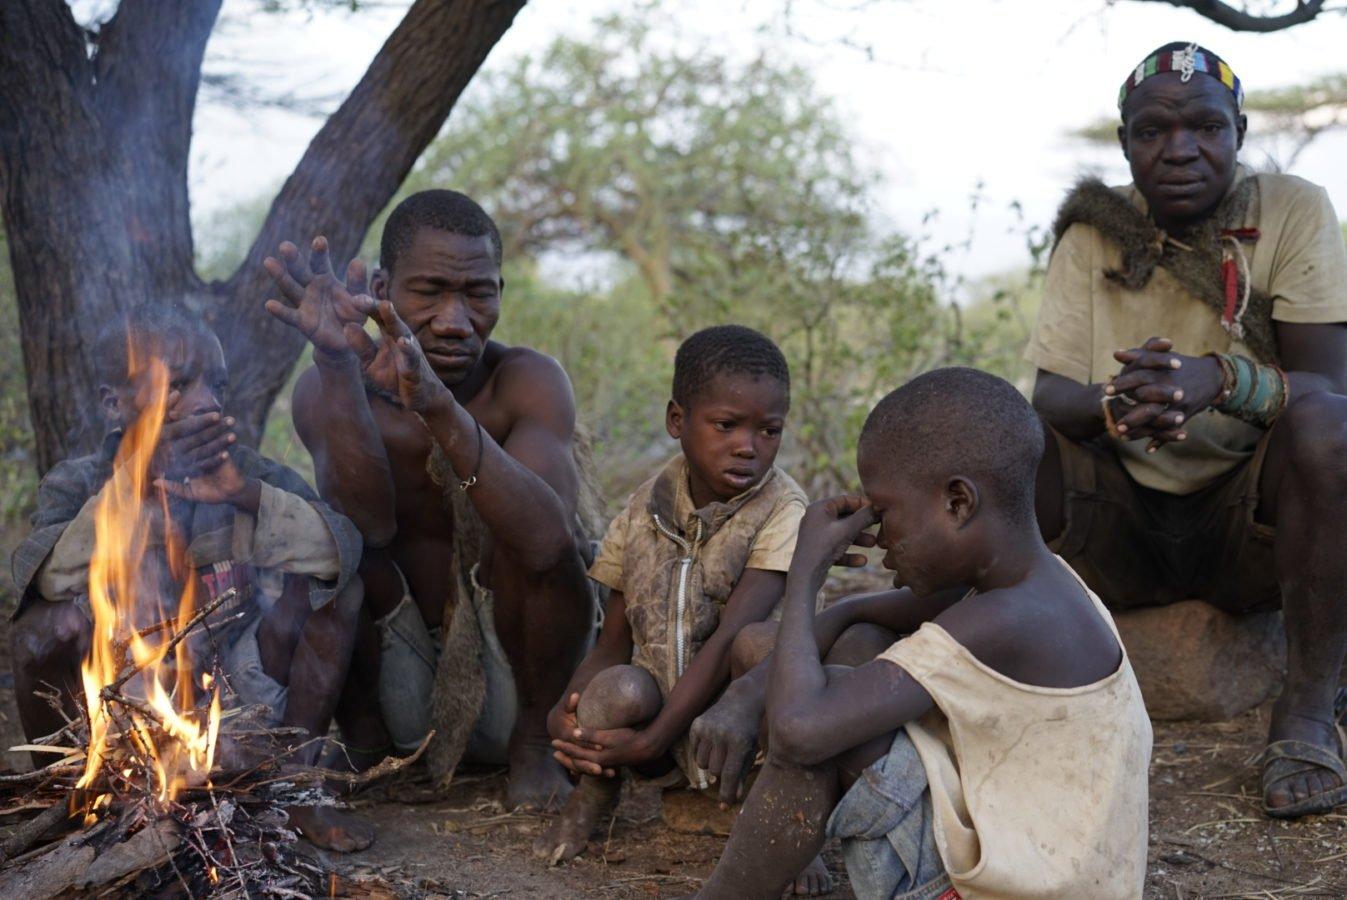 Bushmen of Northern Tanzania